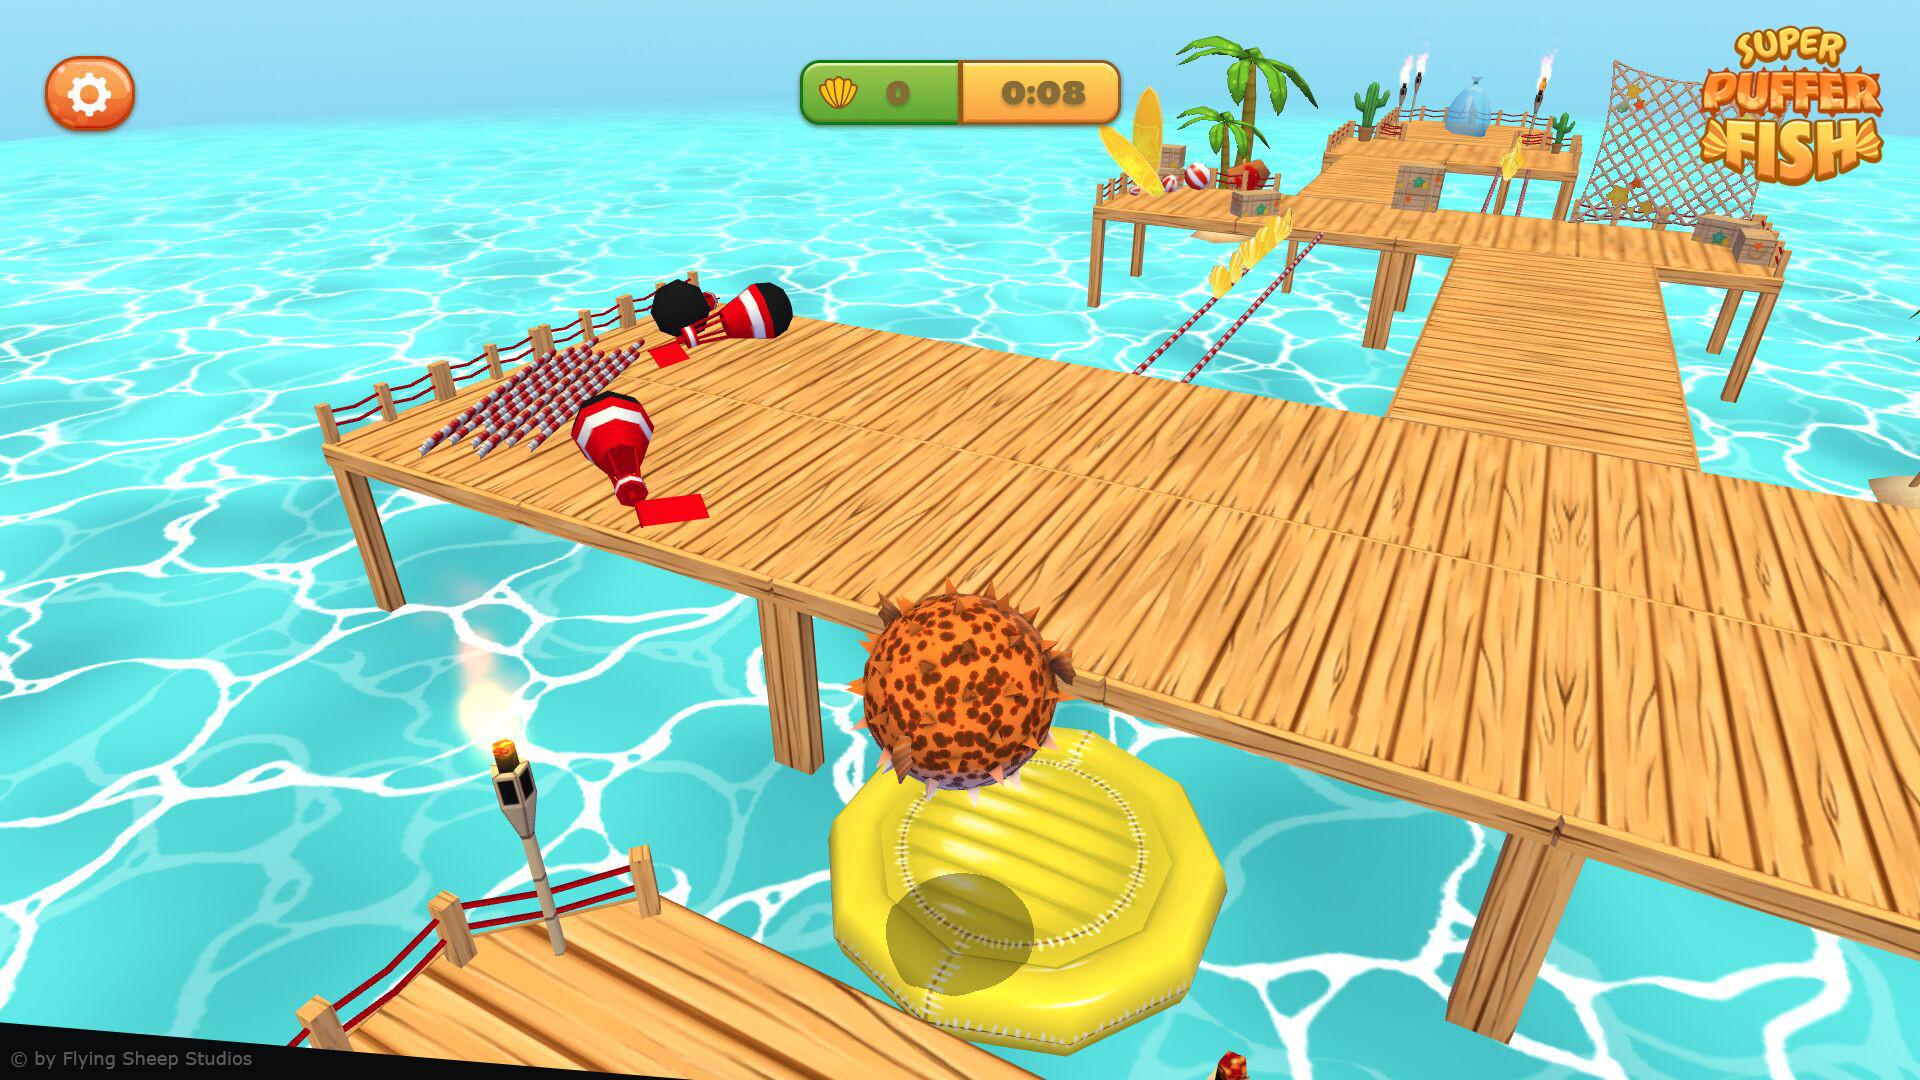 Marina hahn pufferfish screenshot 5